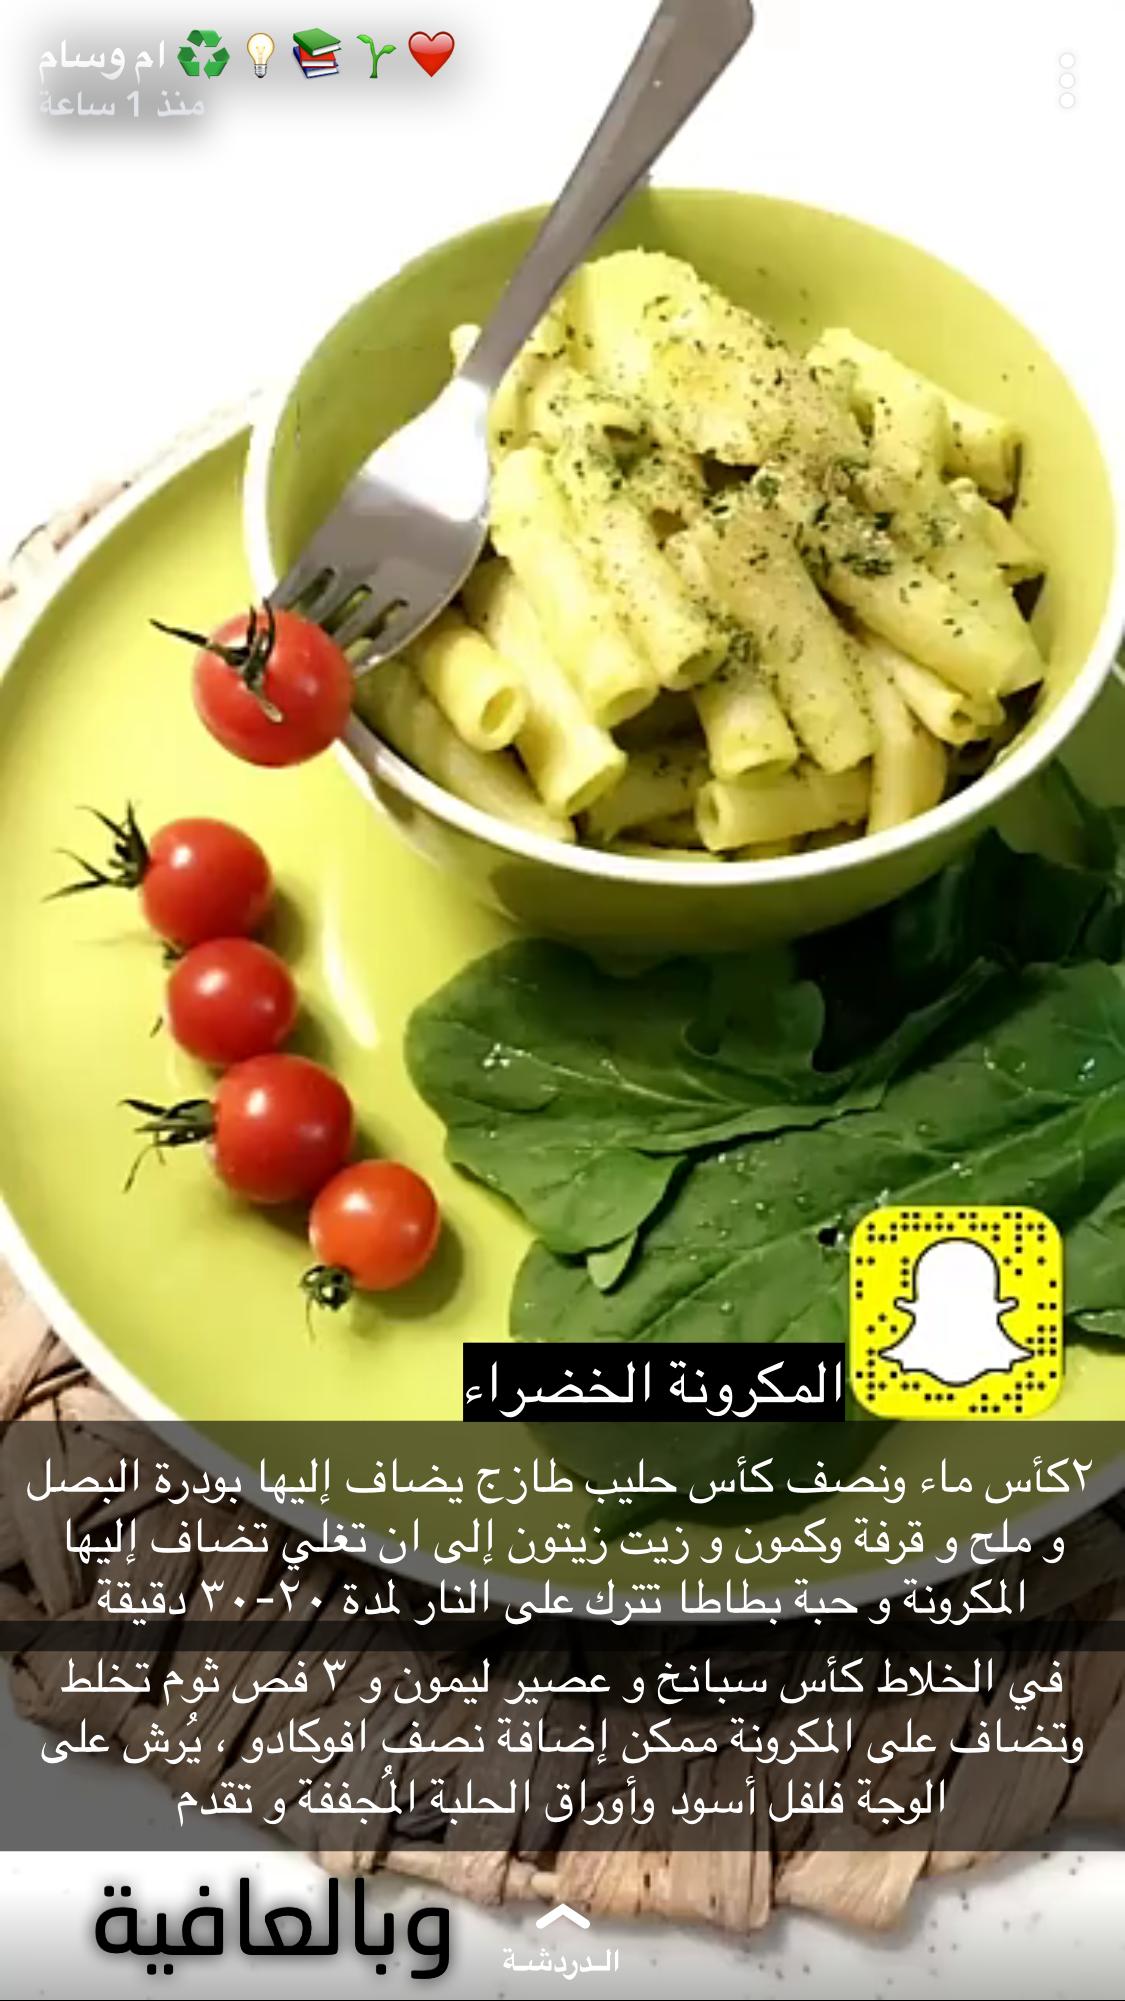 مكرونة خضراء Diet Recipes Cooking Food And Drink